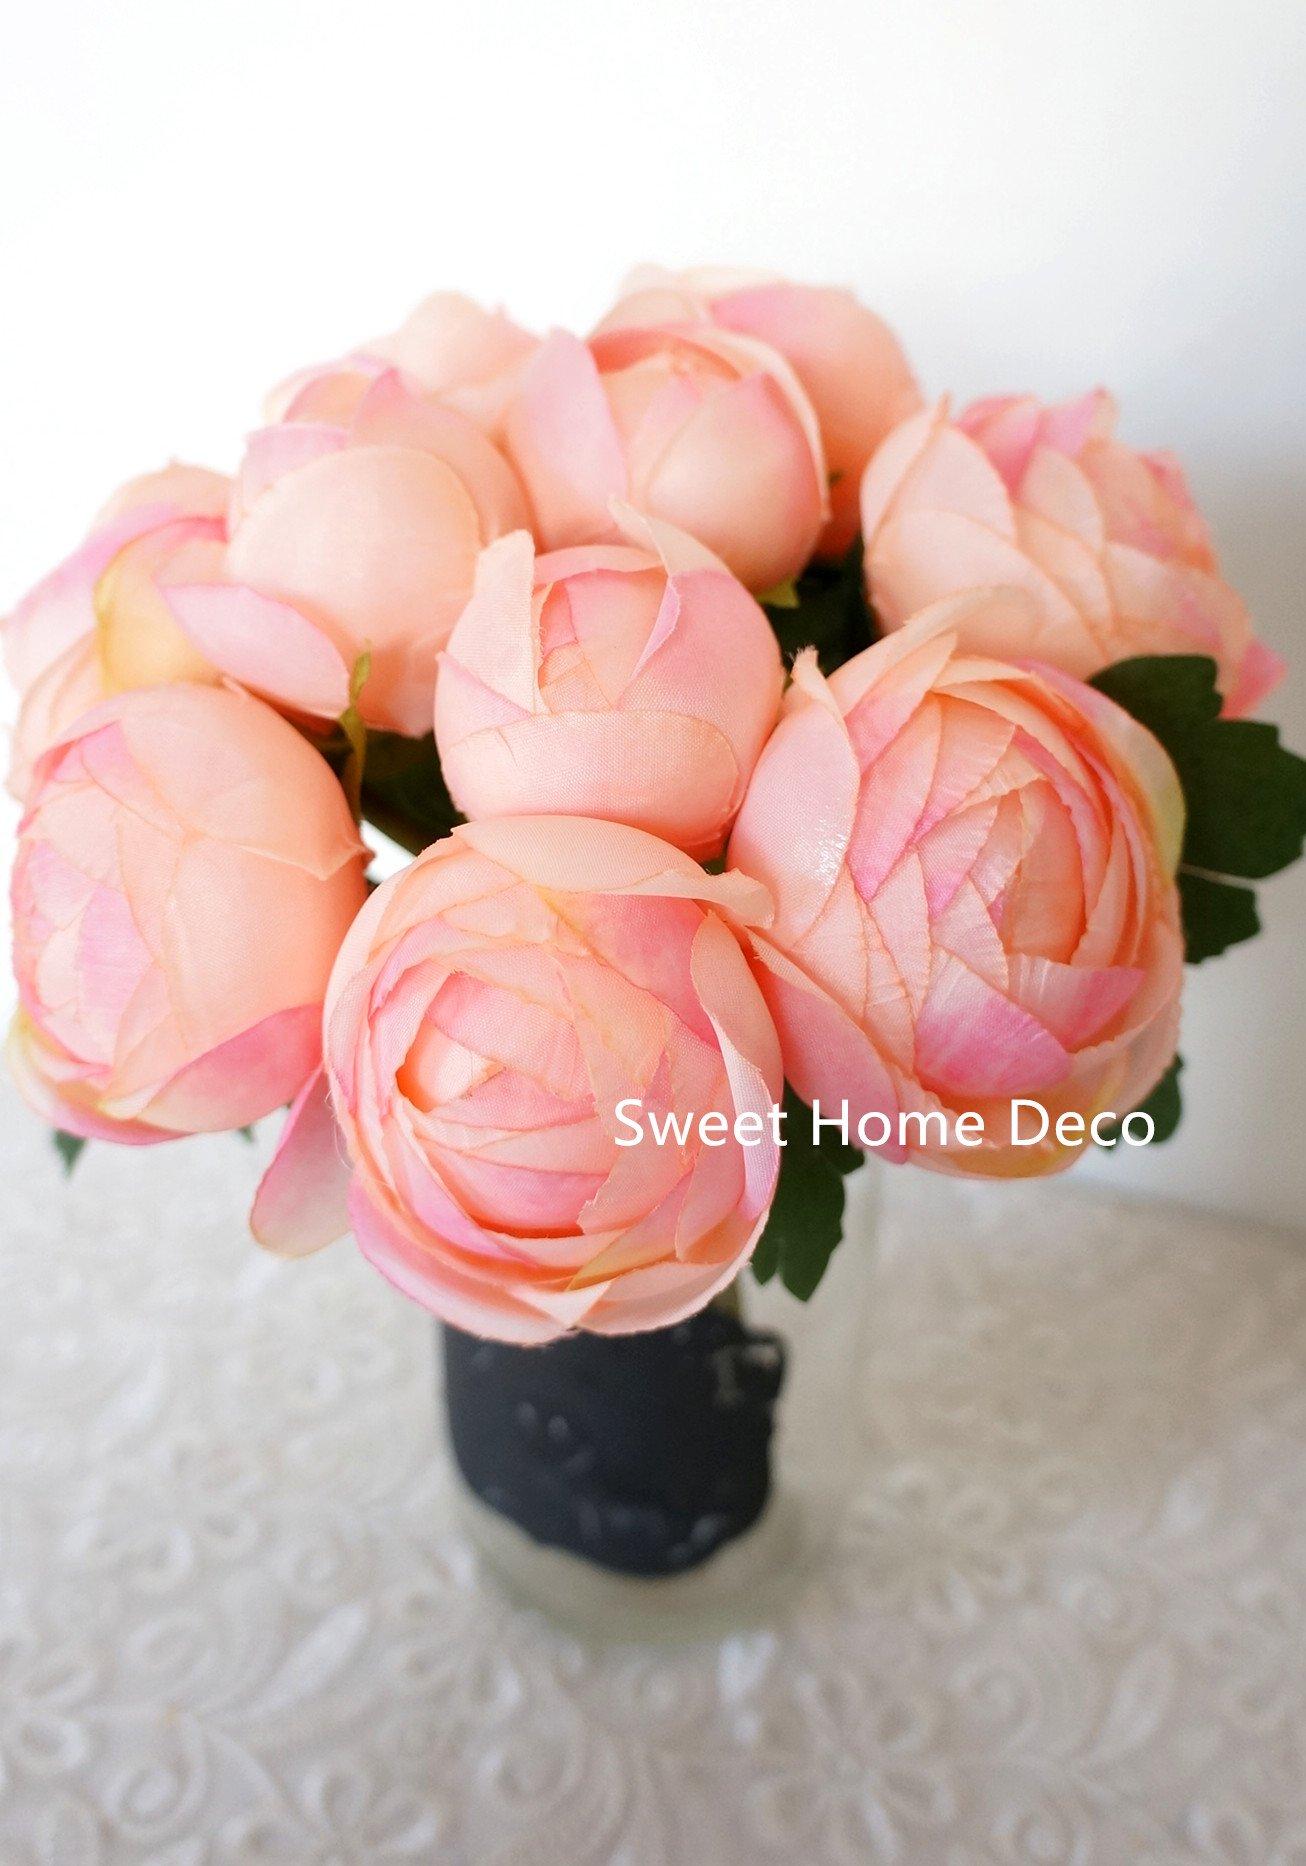 Sweet-Home-Deco-9-Soft-Silk-Ranunculus-Flower-Bouquet-10-Stems10-Flower-Heads-WeddingHome-Decorations-Peach